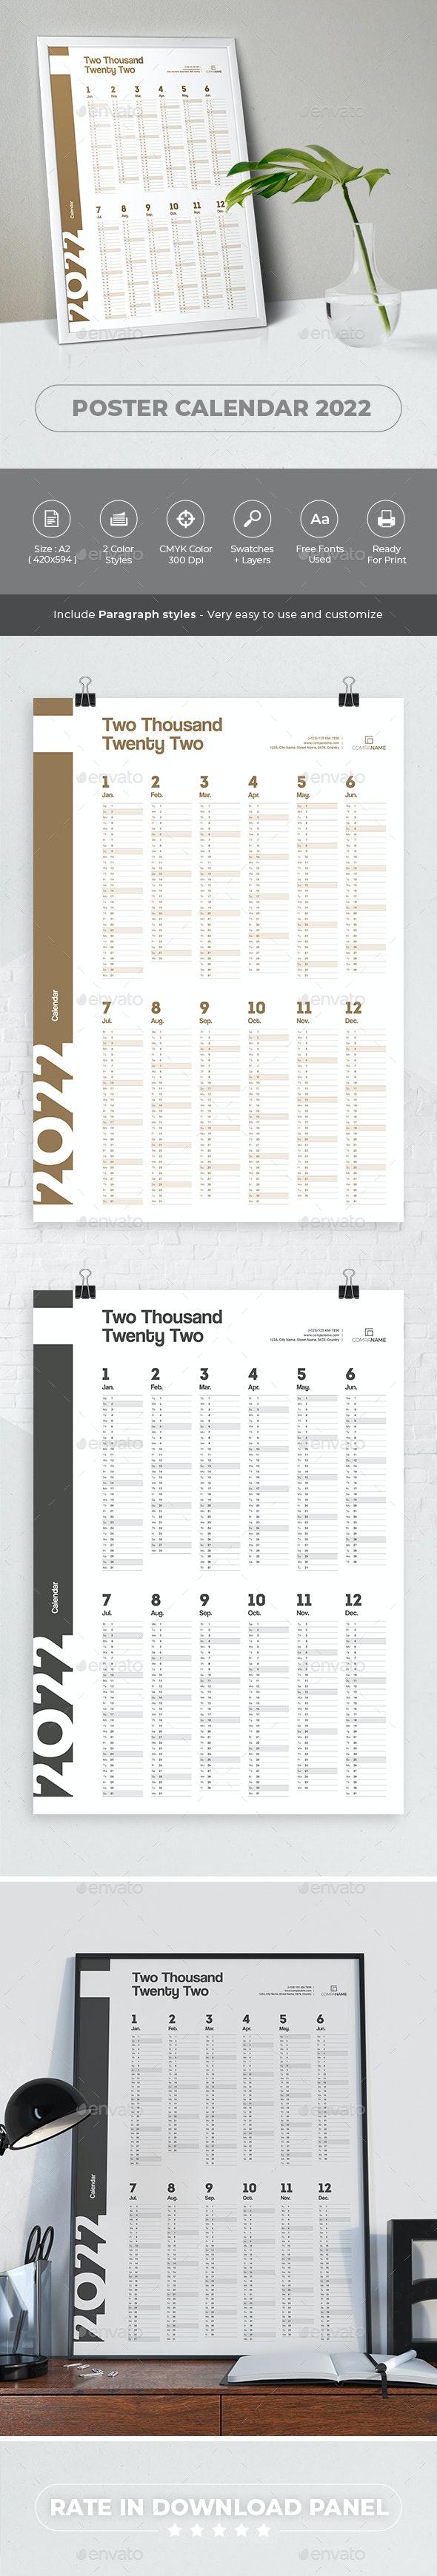 Calendar 2022 Poster - Calendars Stationery